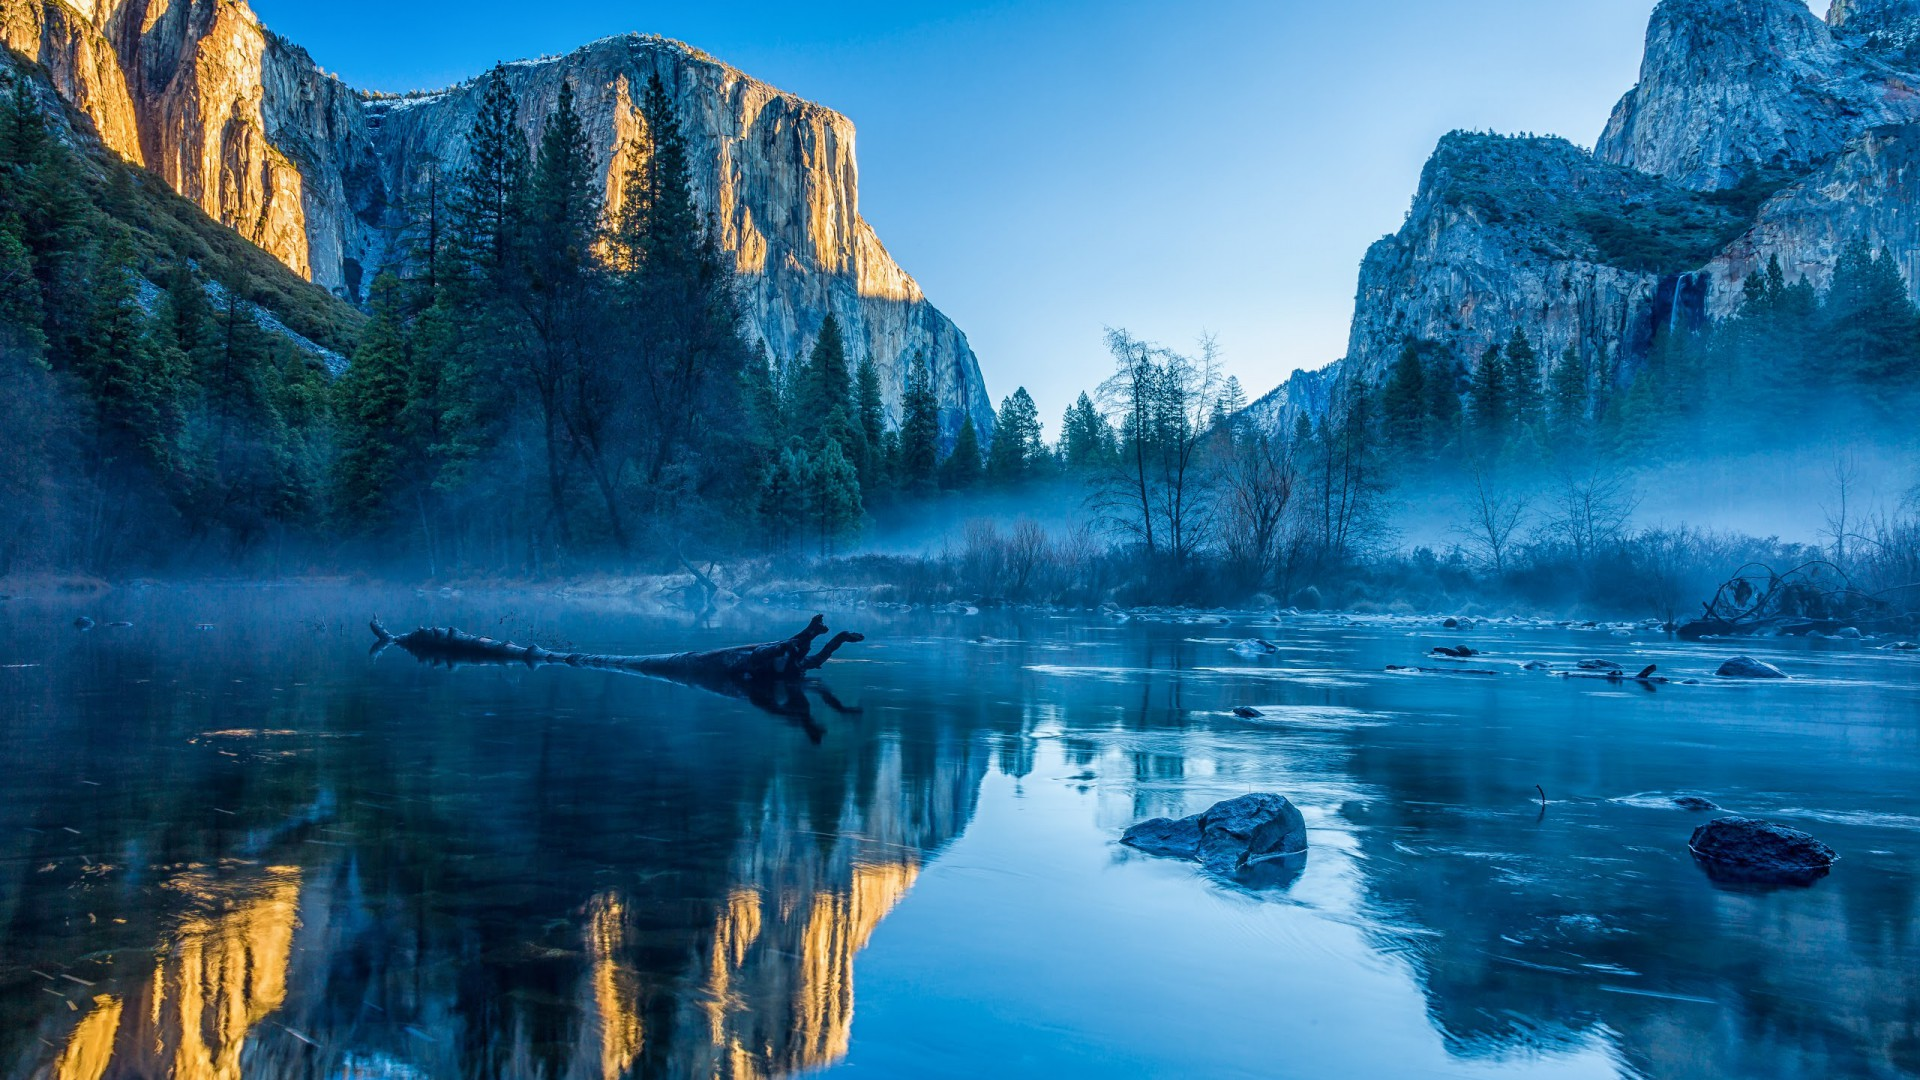 Yosemite el capitan 5k wallpapers winter forest osx - 5k wallpapers nature ...